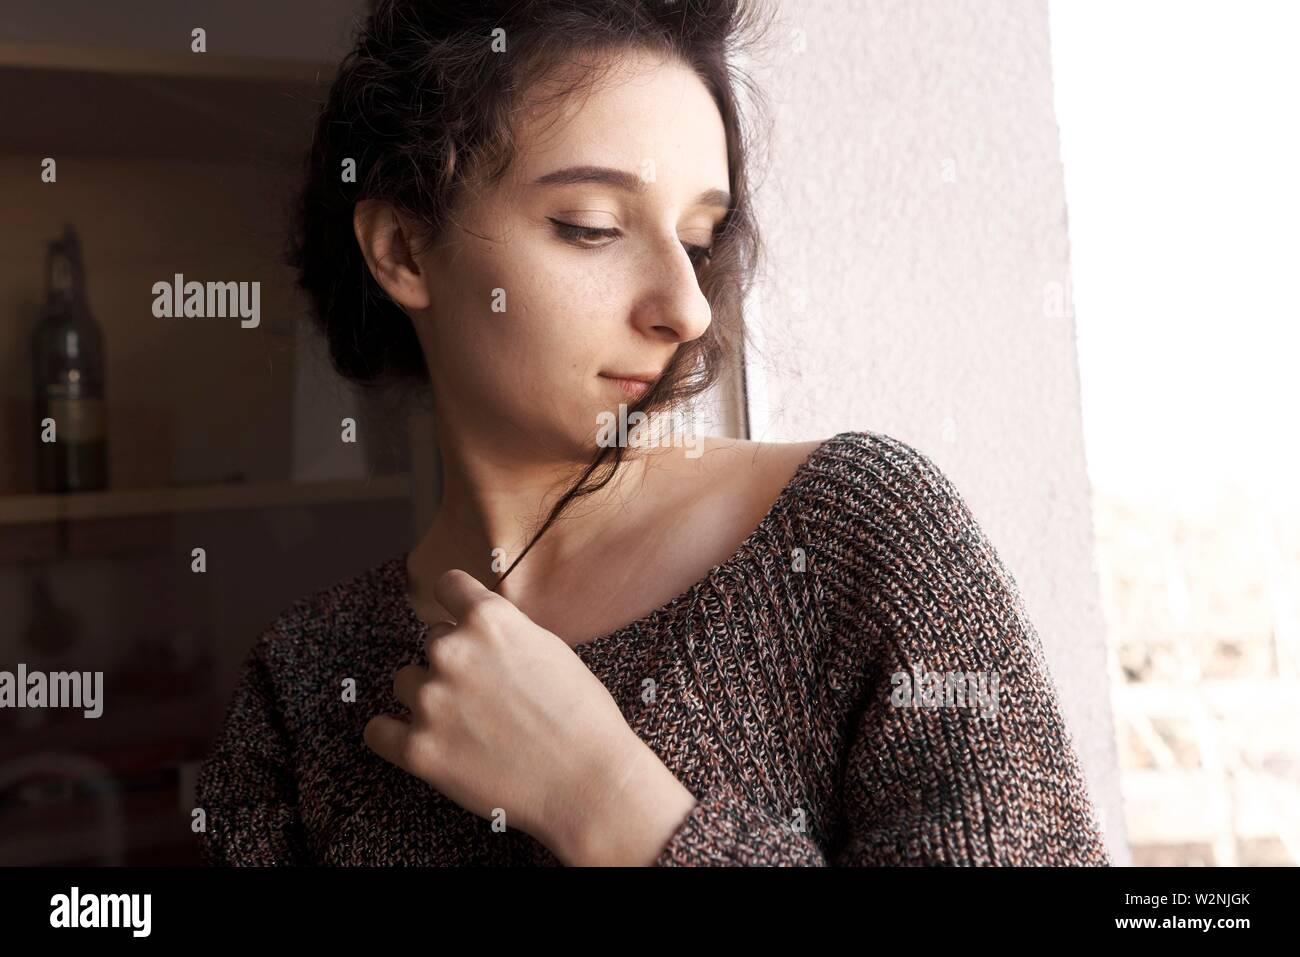 Joven Mujer sentimental en casa Foto de stock